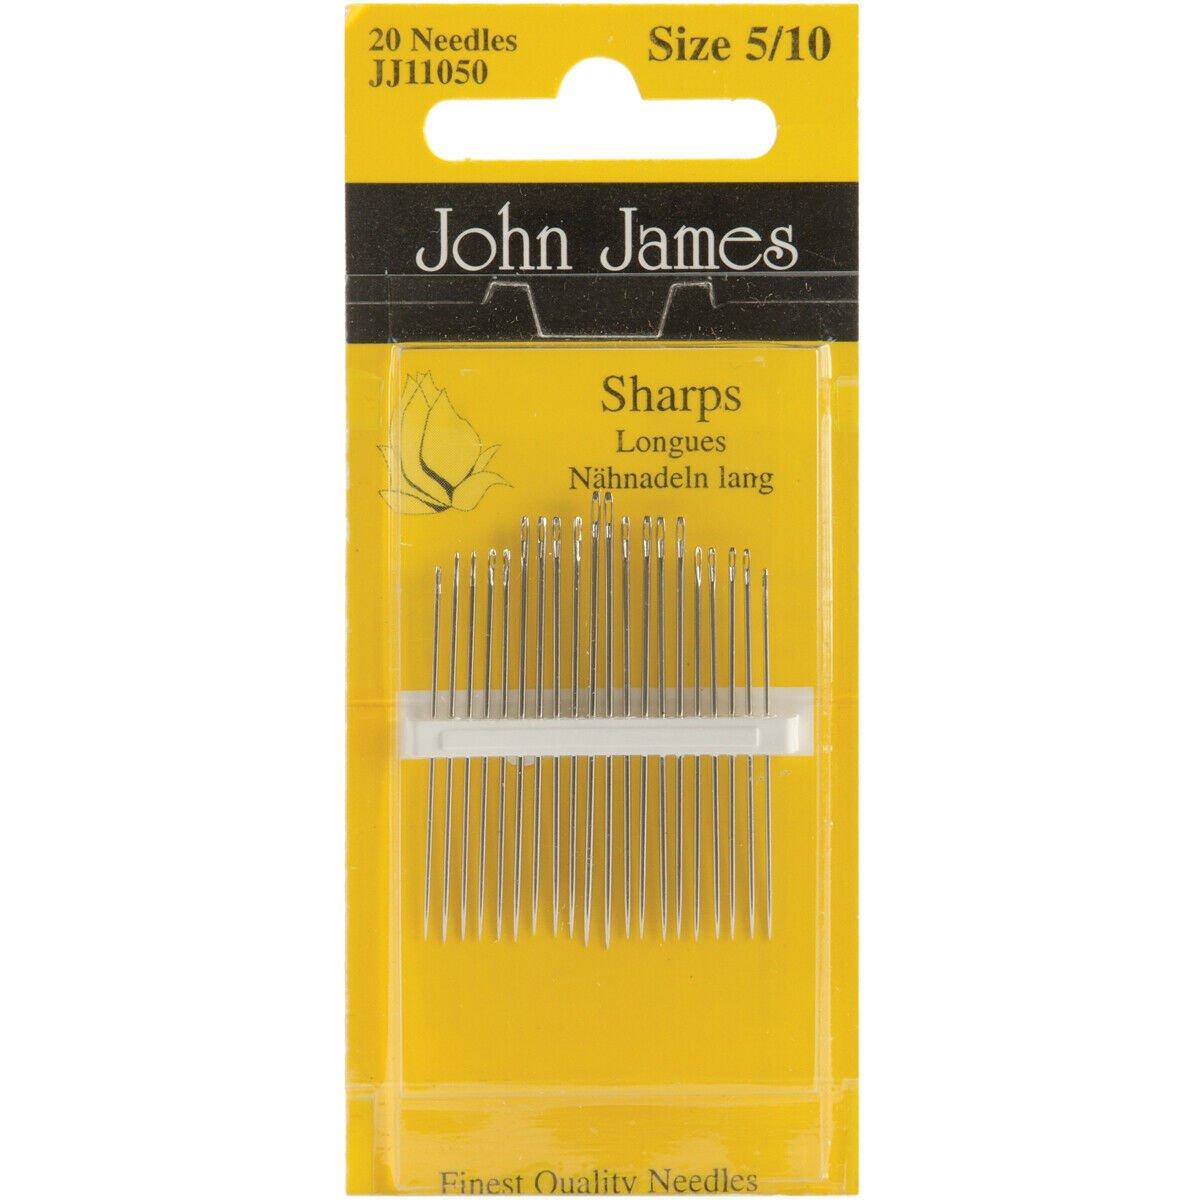 JJ11050 John James Sharps 5/10